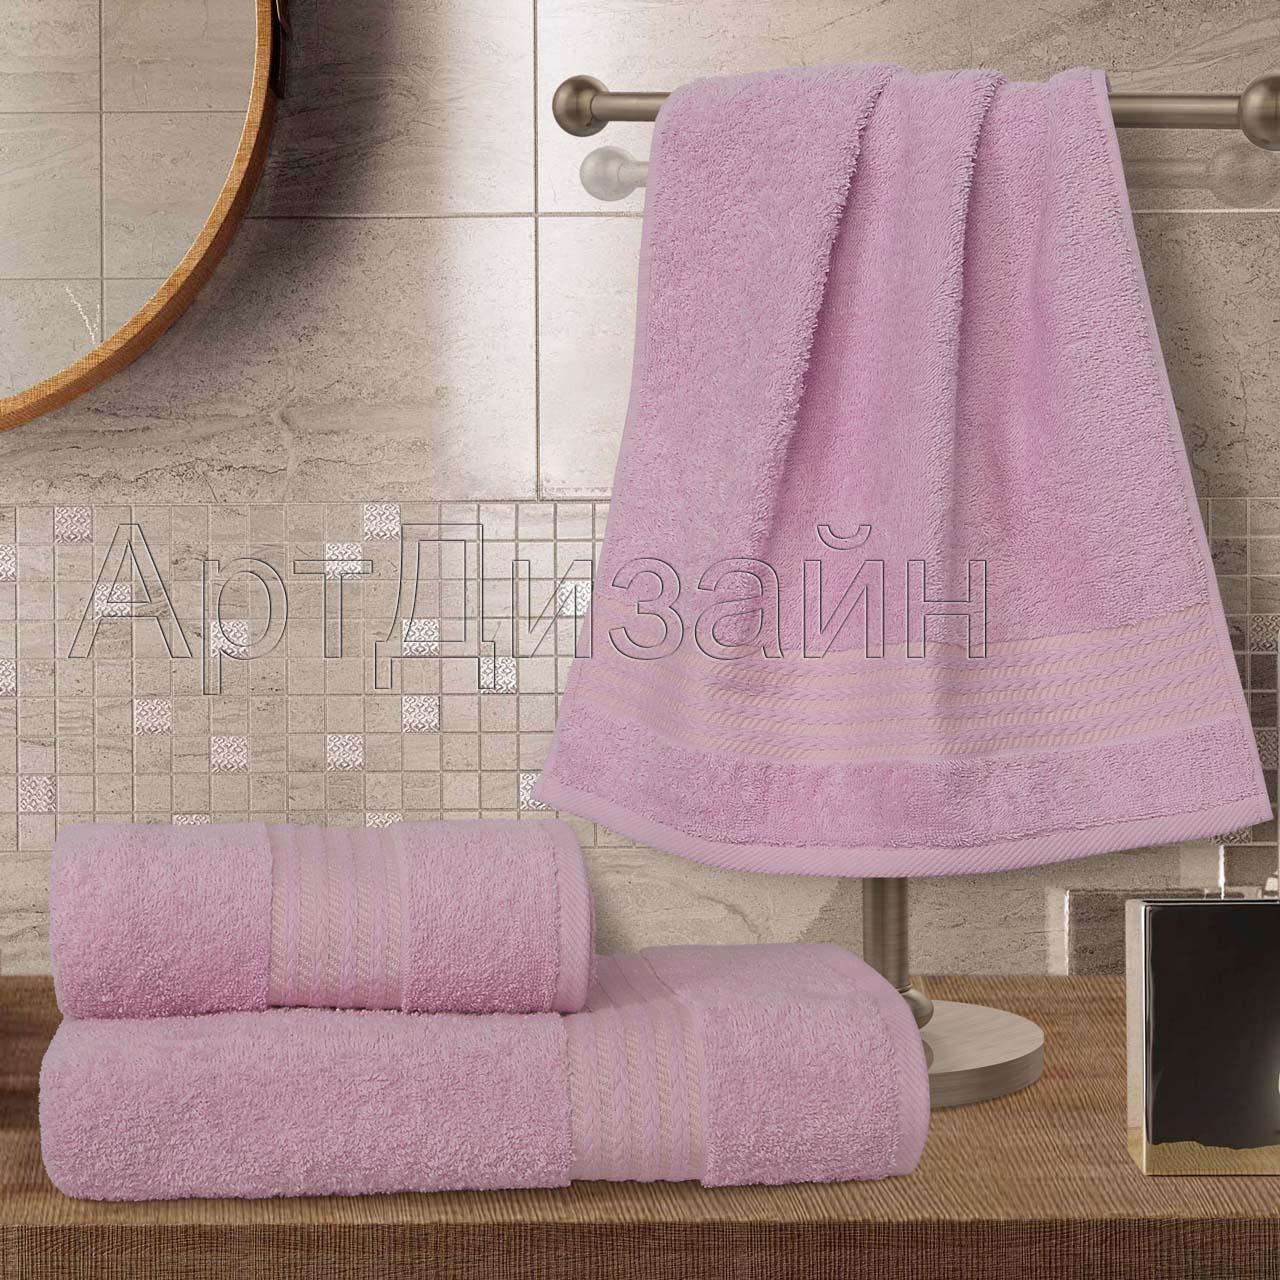 Полотенце Классик Холодно-розовый р. 40х70Махровые полотенца<br>Плотность:400 г/кв. м<br><br>Тип: Полотенце<br>Размер: 40х70<br>Материал: Махра